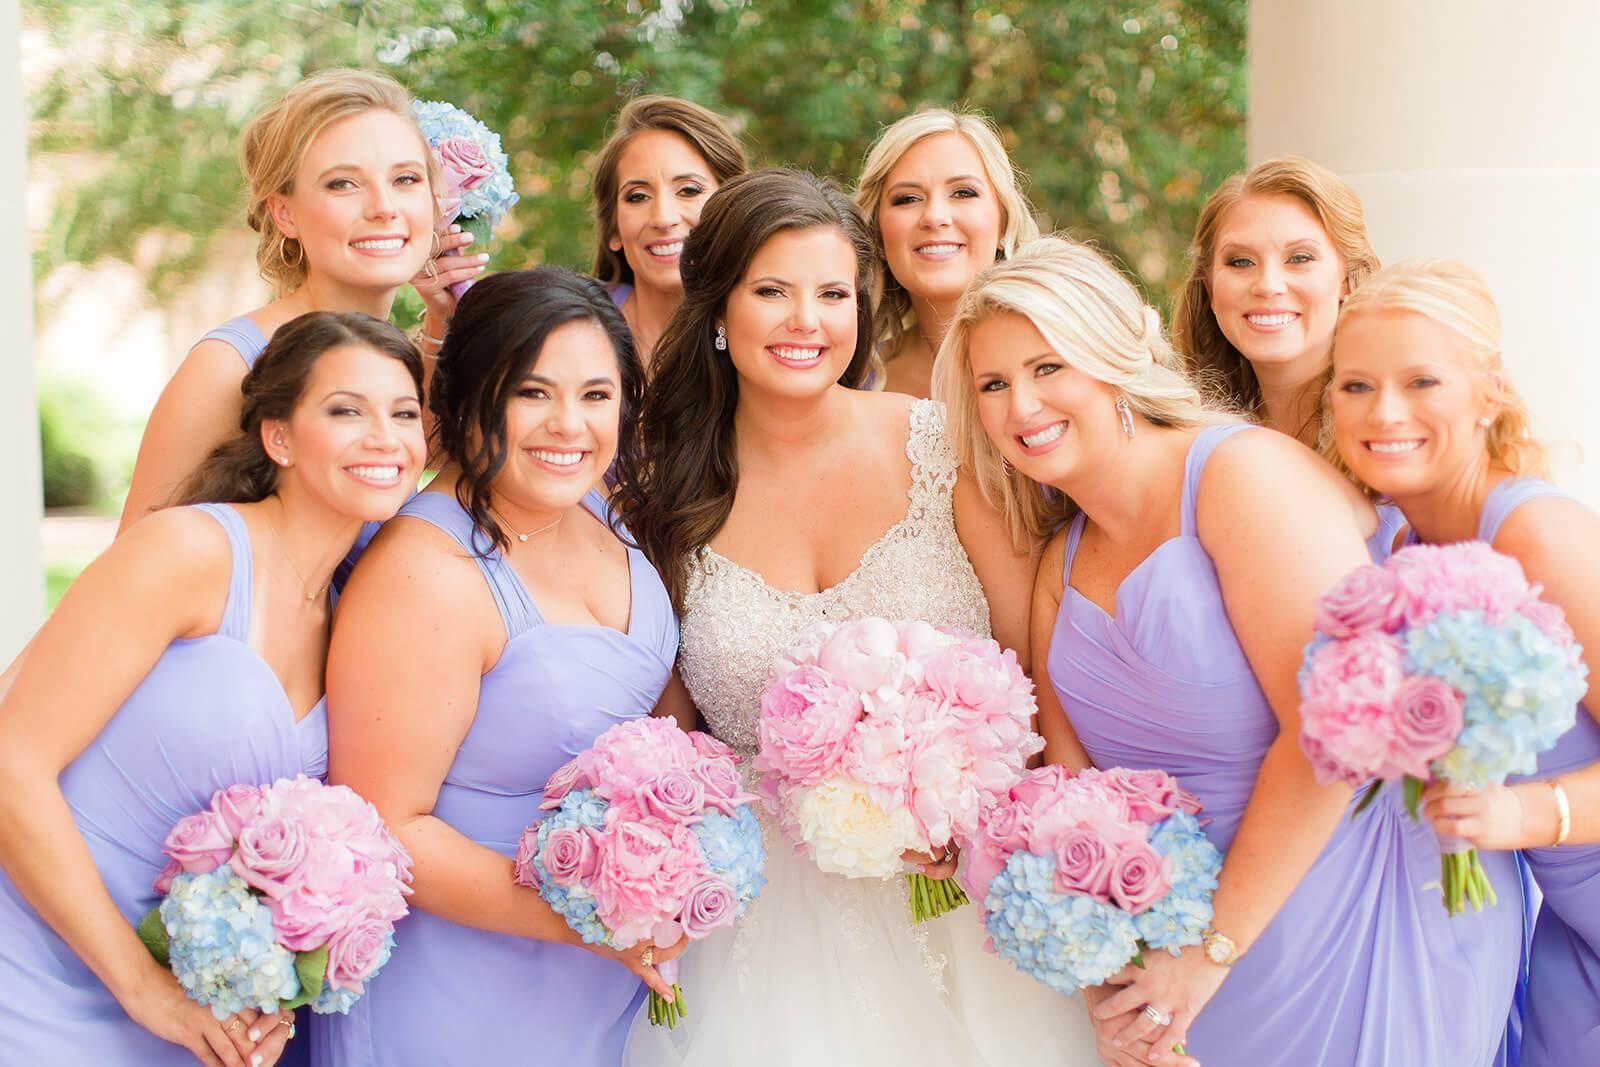 Dessy lavender bridesmaid dresses